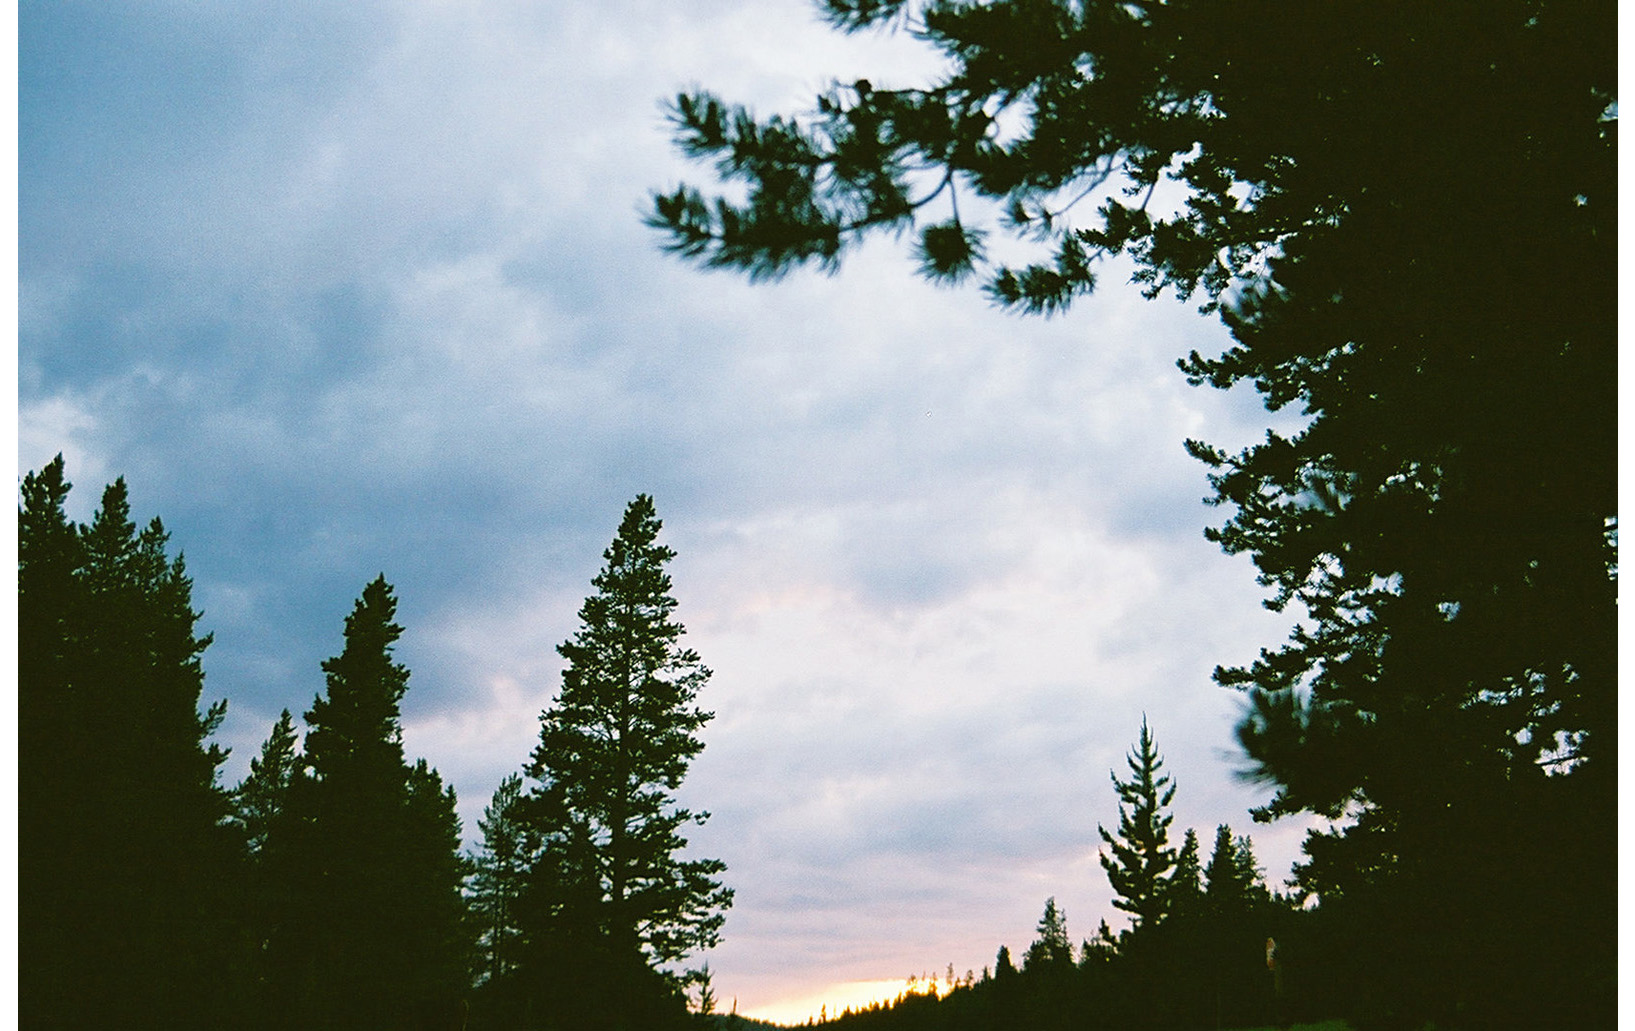 wild west camping 52.jpg